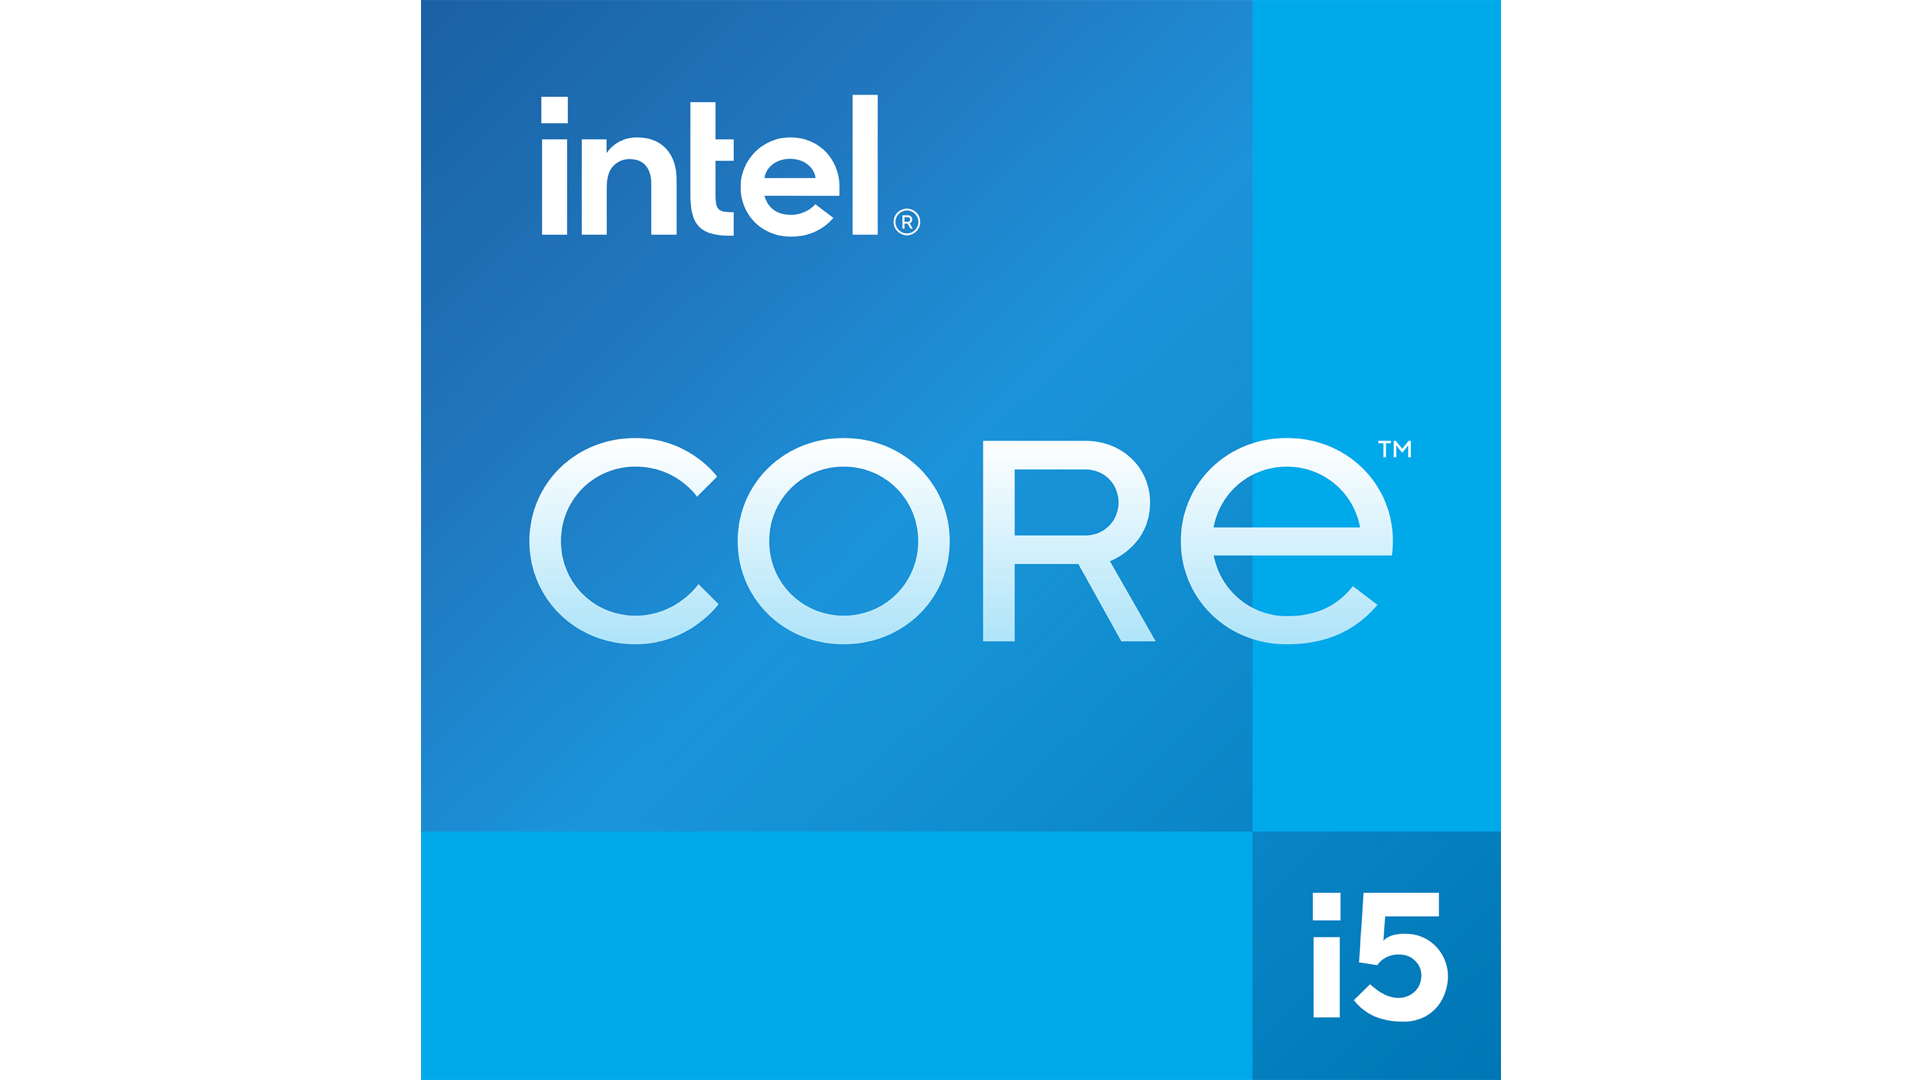 Intel Core i5 11400F - 2.6 GHz - 6 Kerne - 12 Threads